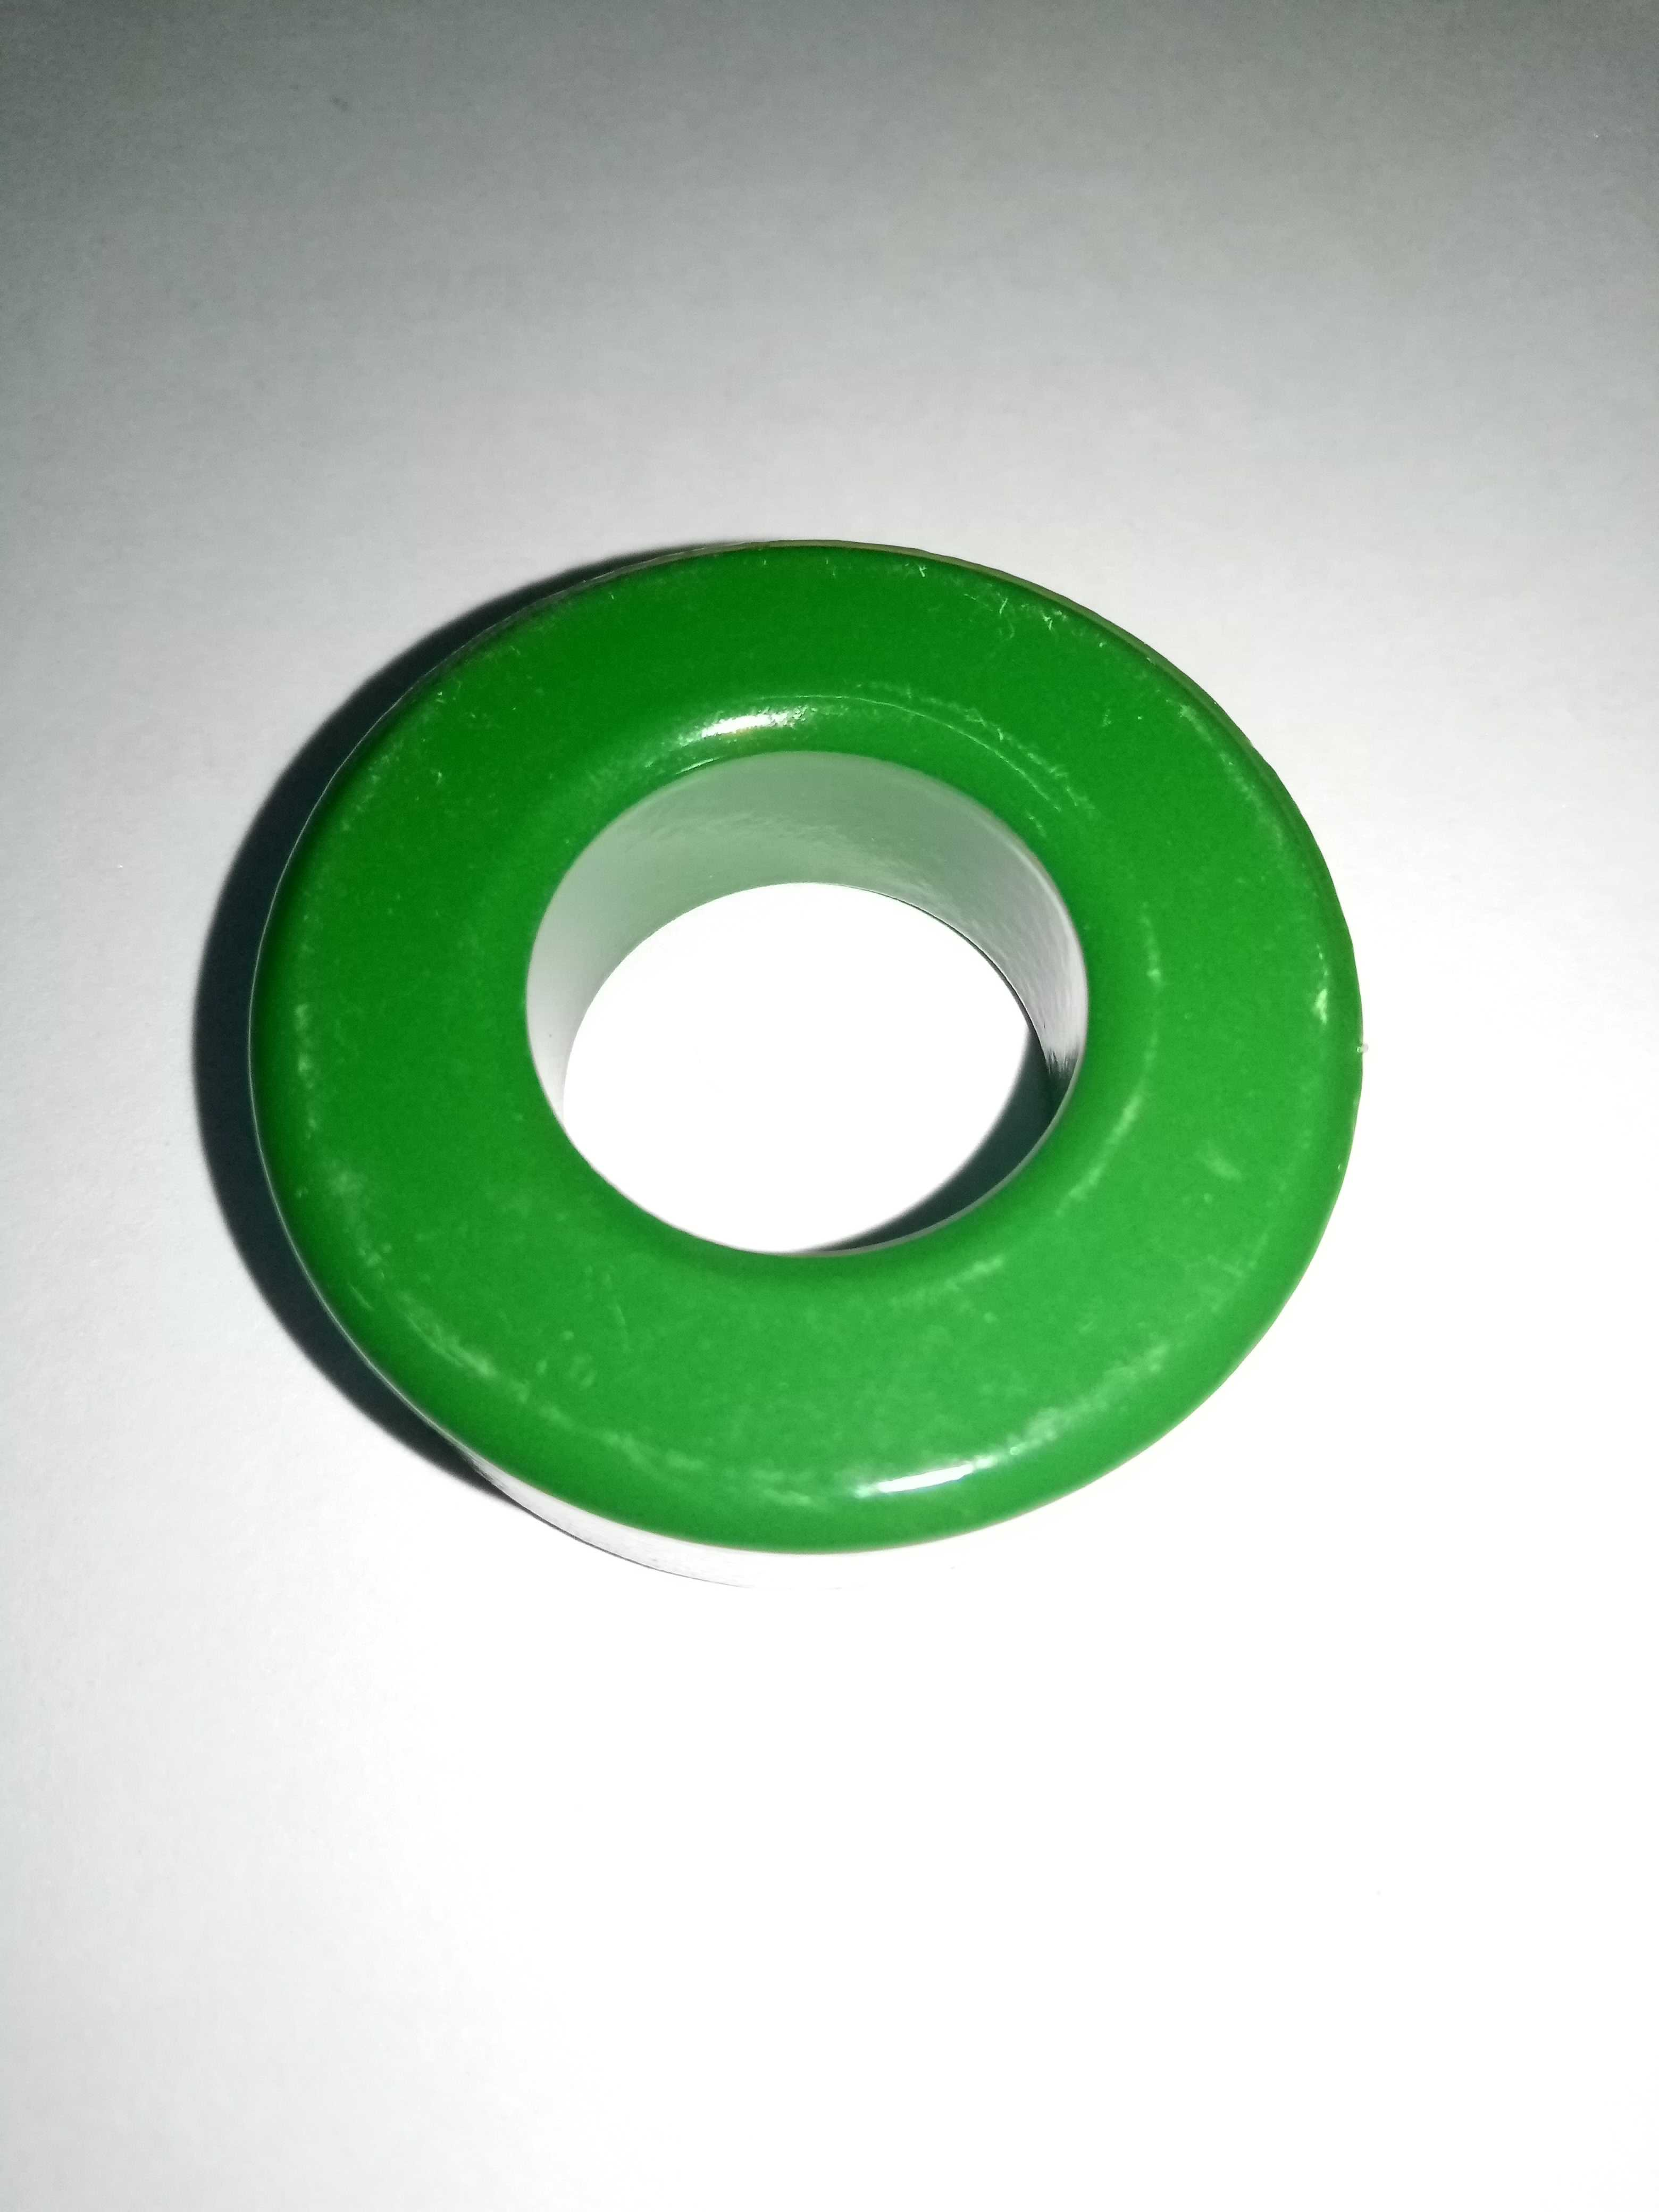 Nickel-zinc Magnetic Ring Short-wave Antenna End-feeding Antenna Balun